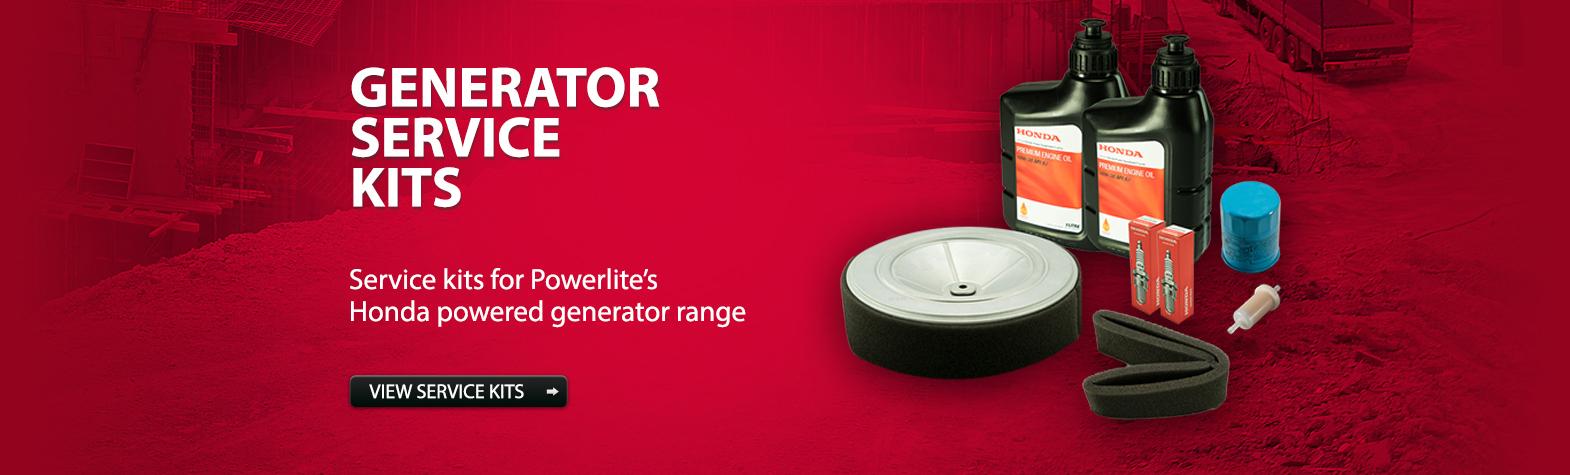 Generator Service Kits